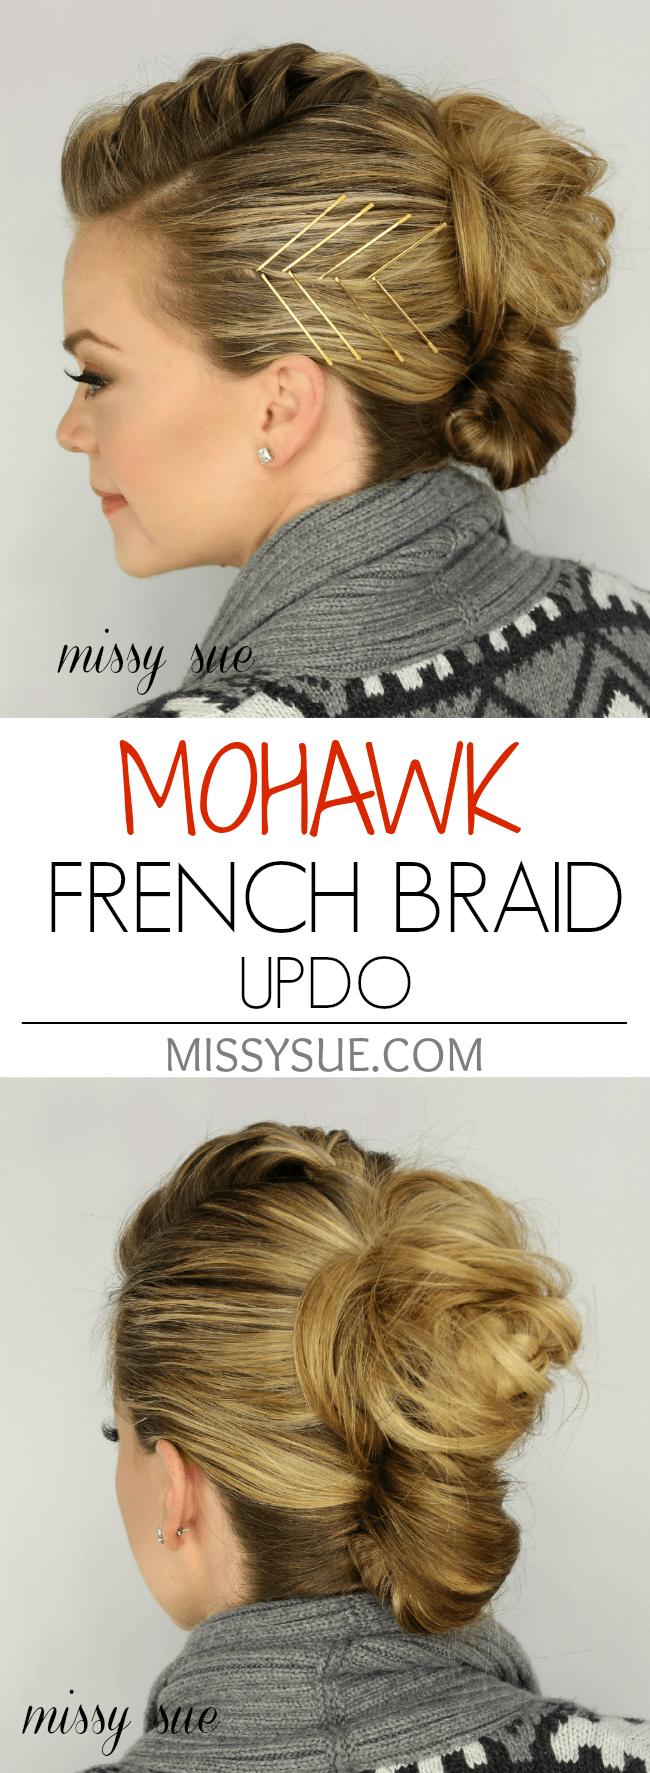 Mohawk French Braid Updo